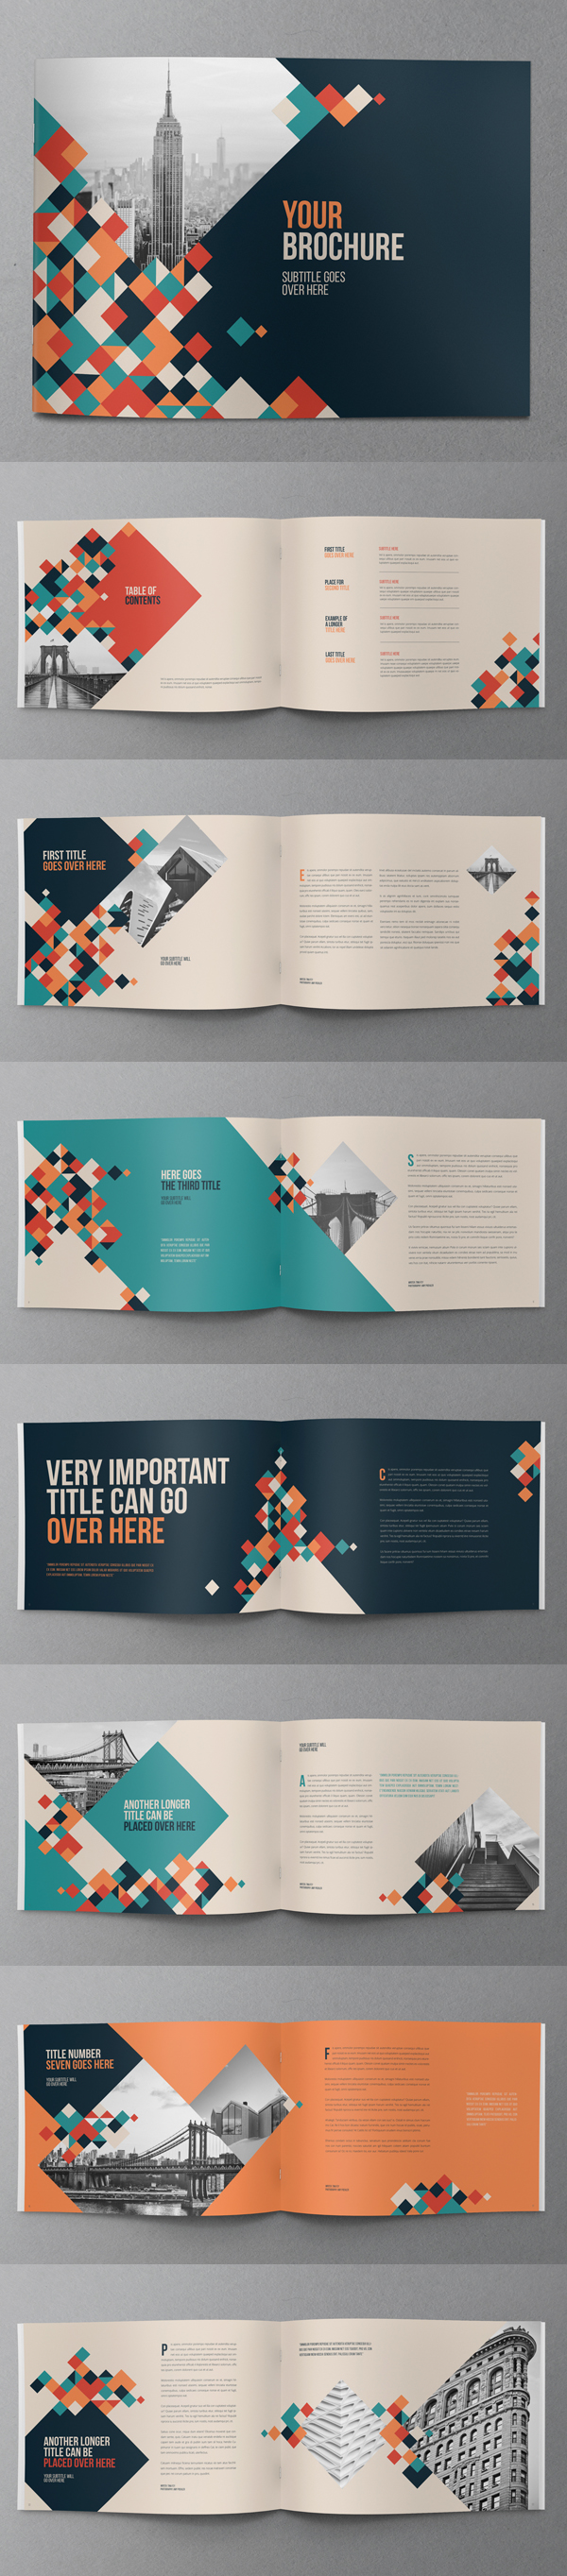 Creative Colorful Squares Brochure Design